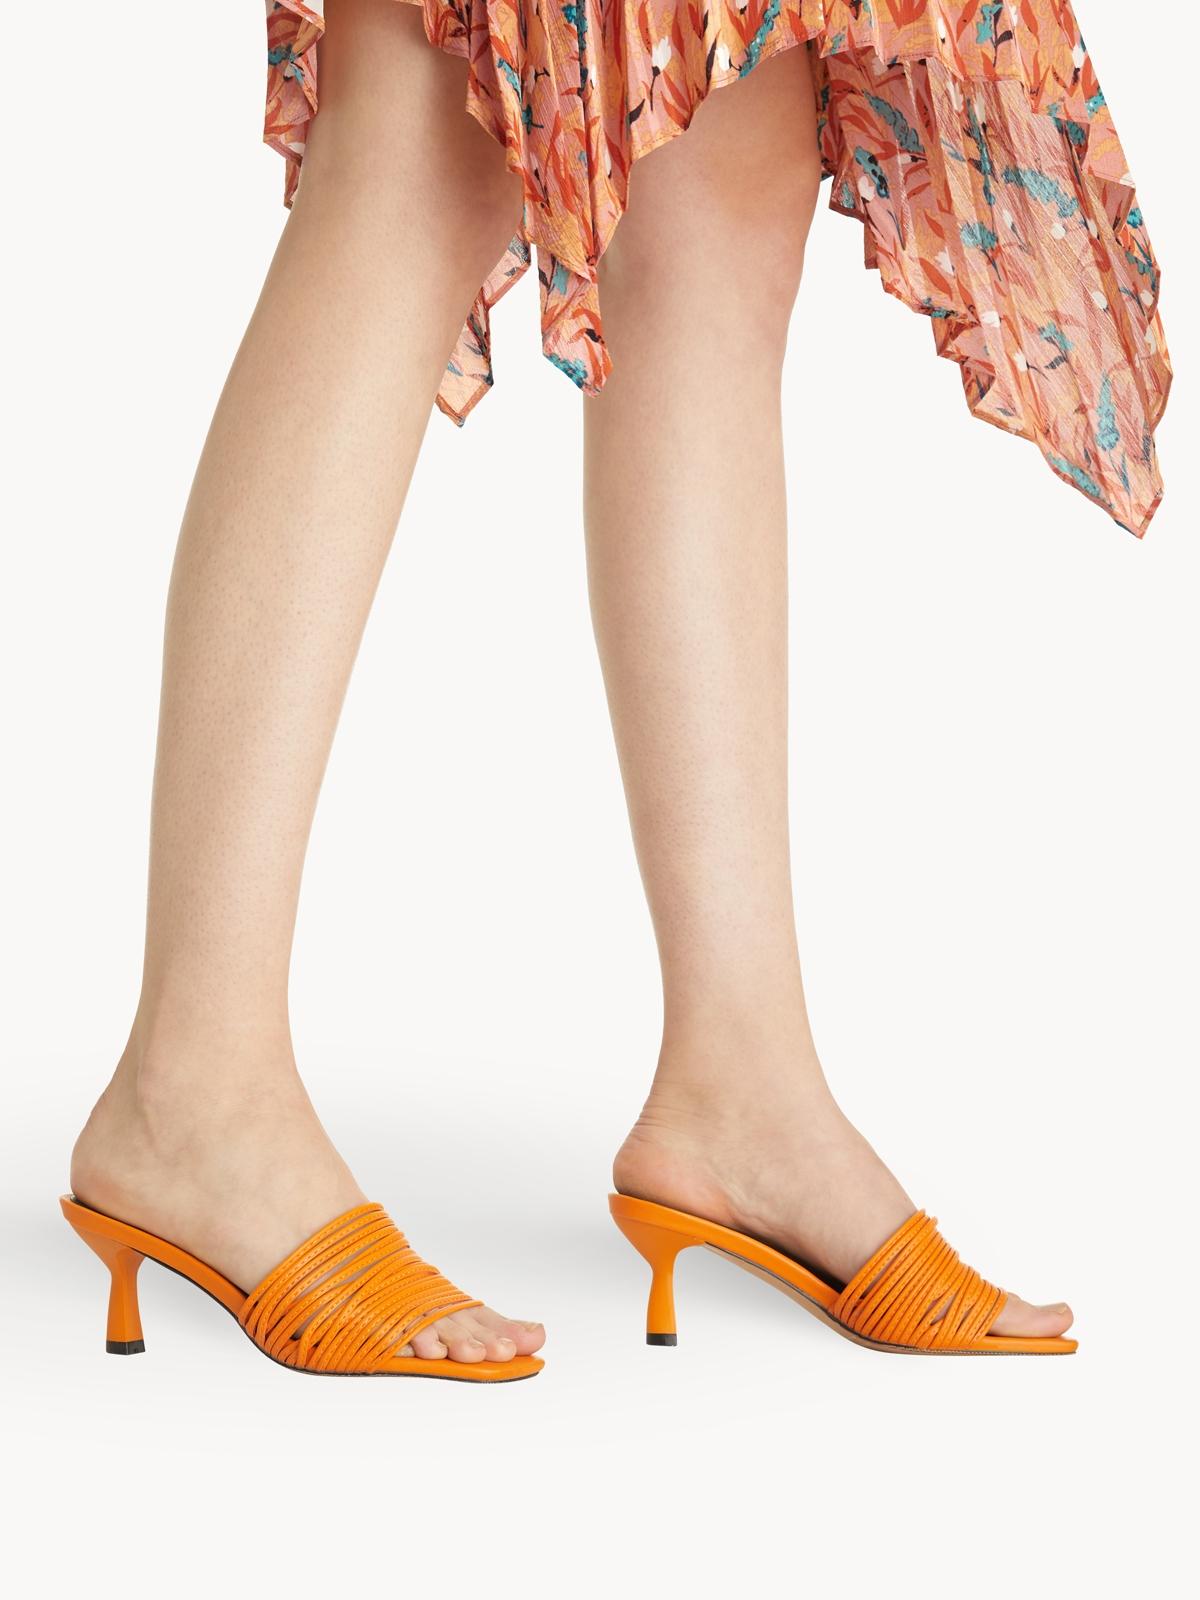 Starkela Strapzie Heels Orange